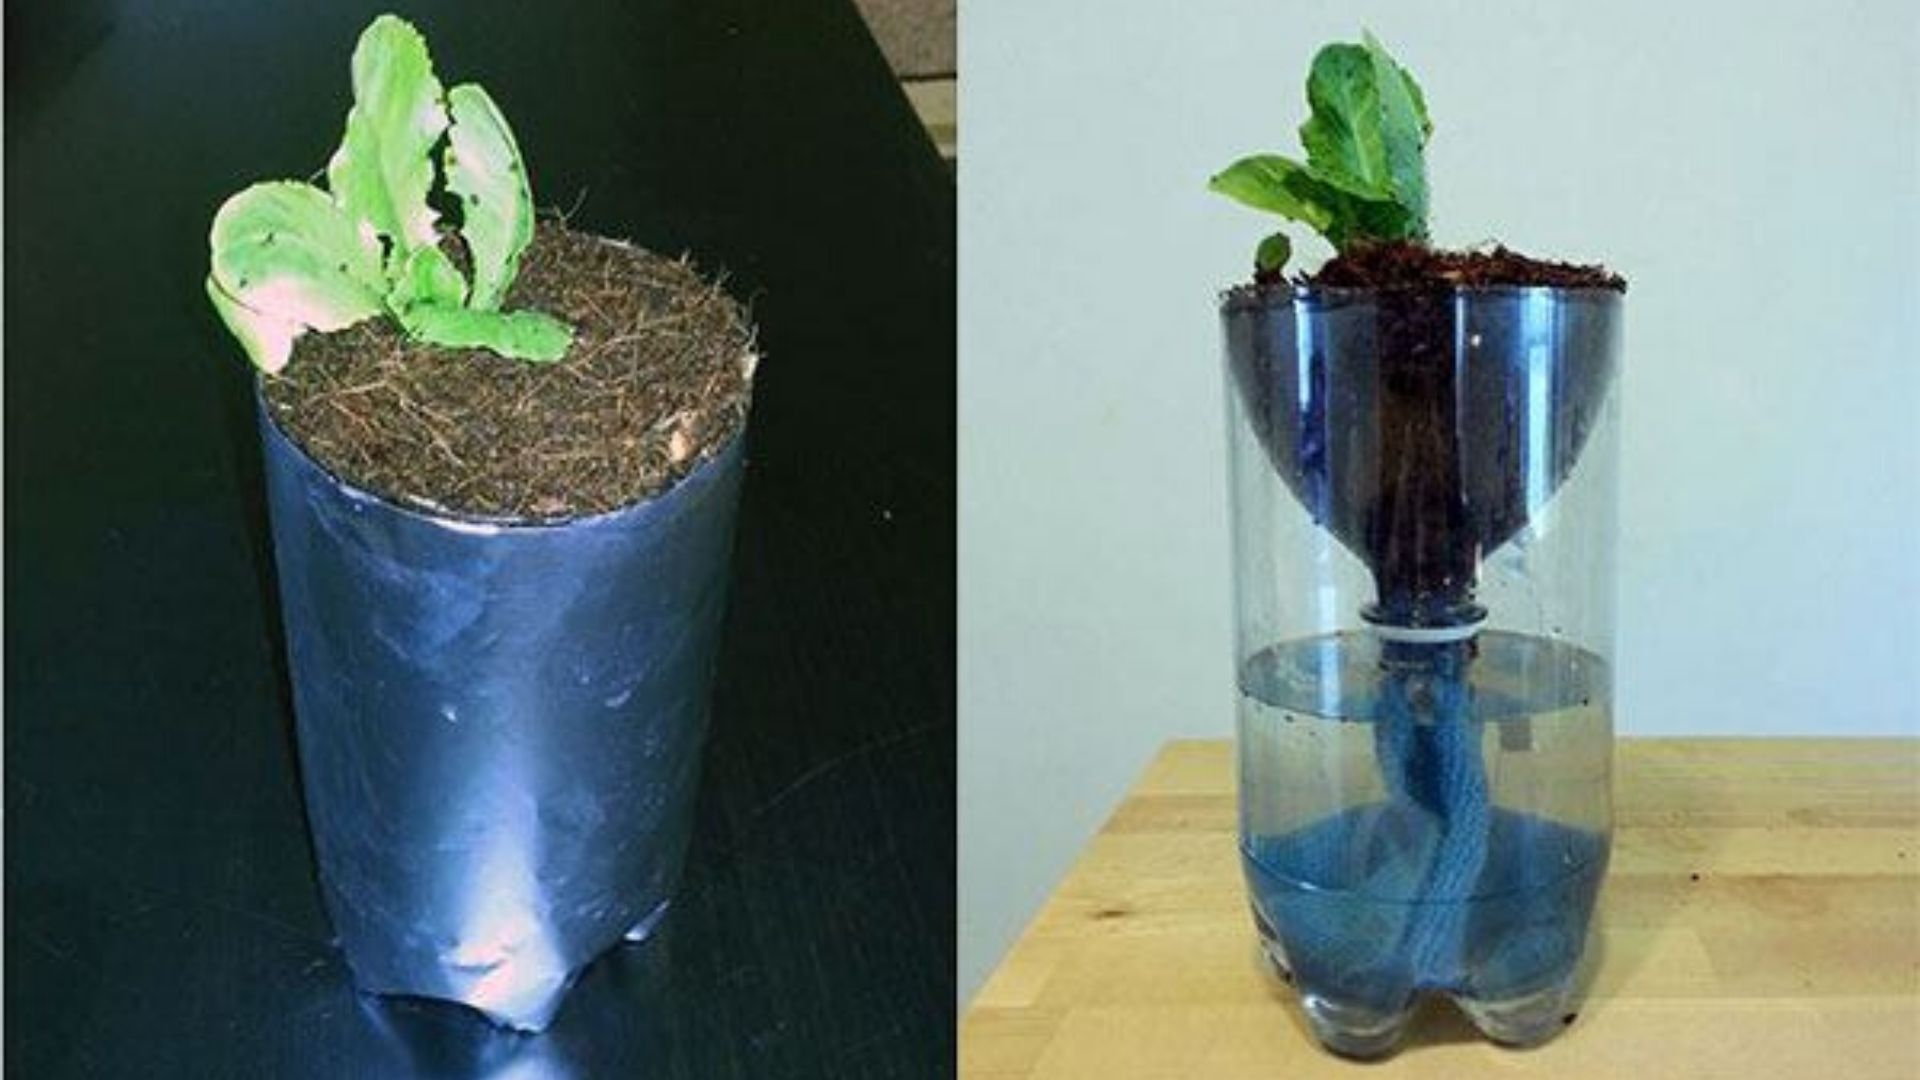 Image of Building a 2 Liter Bottle Garden